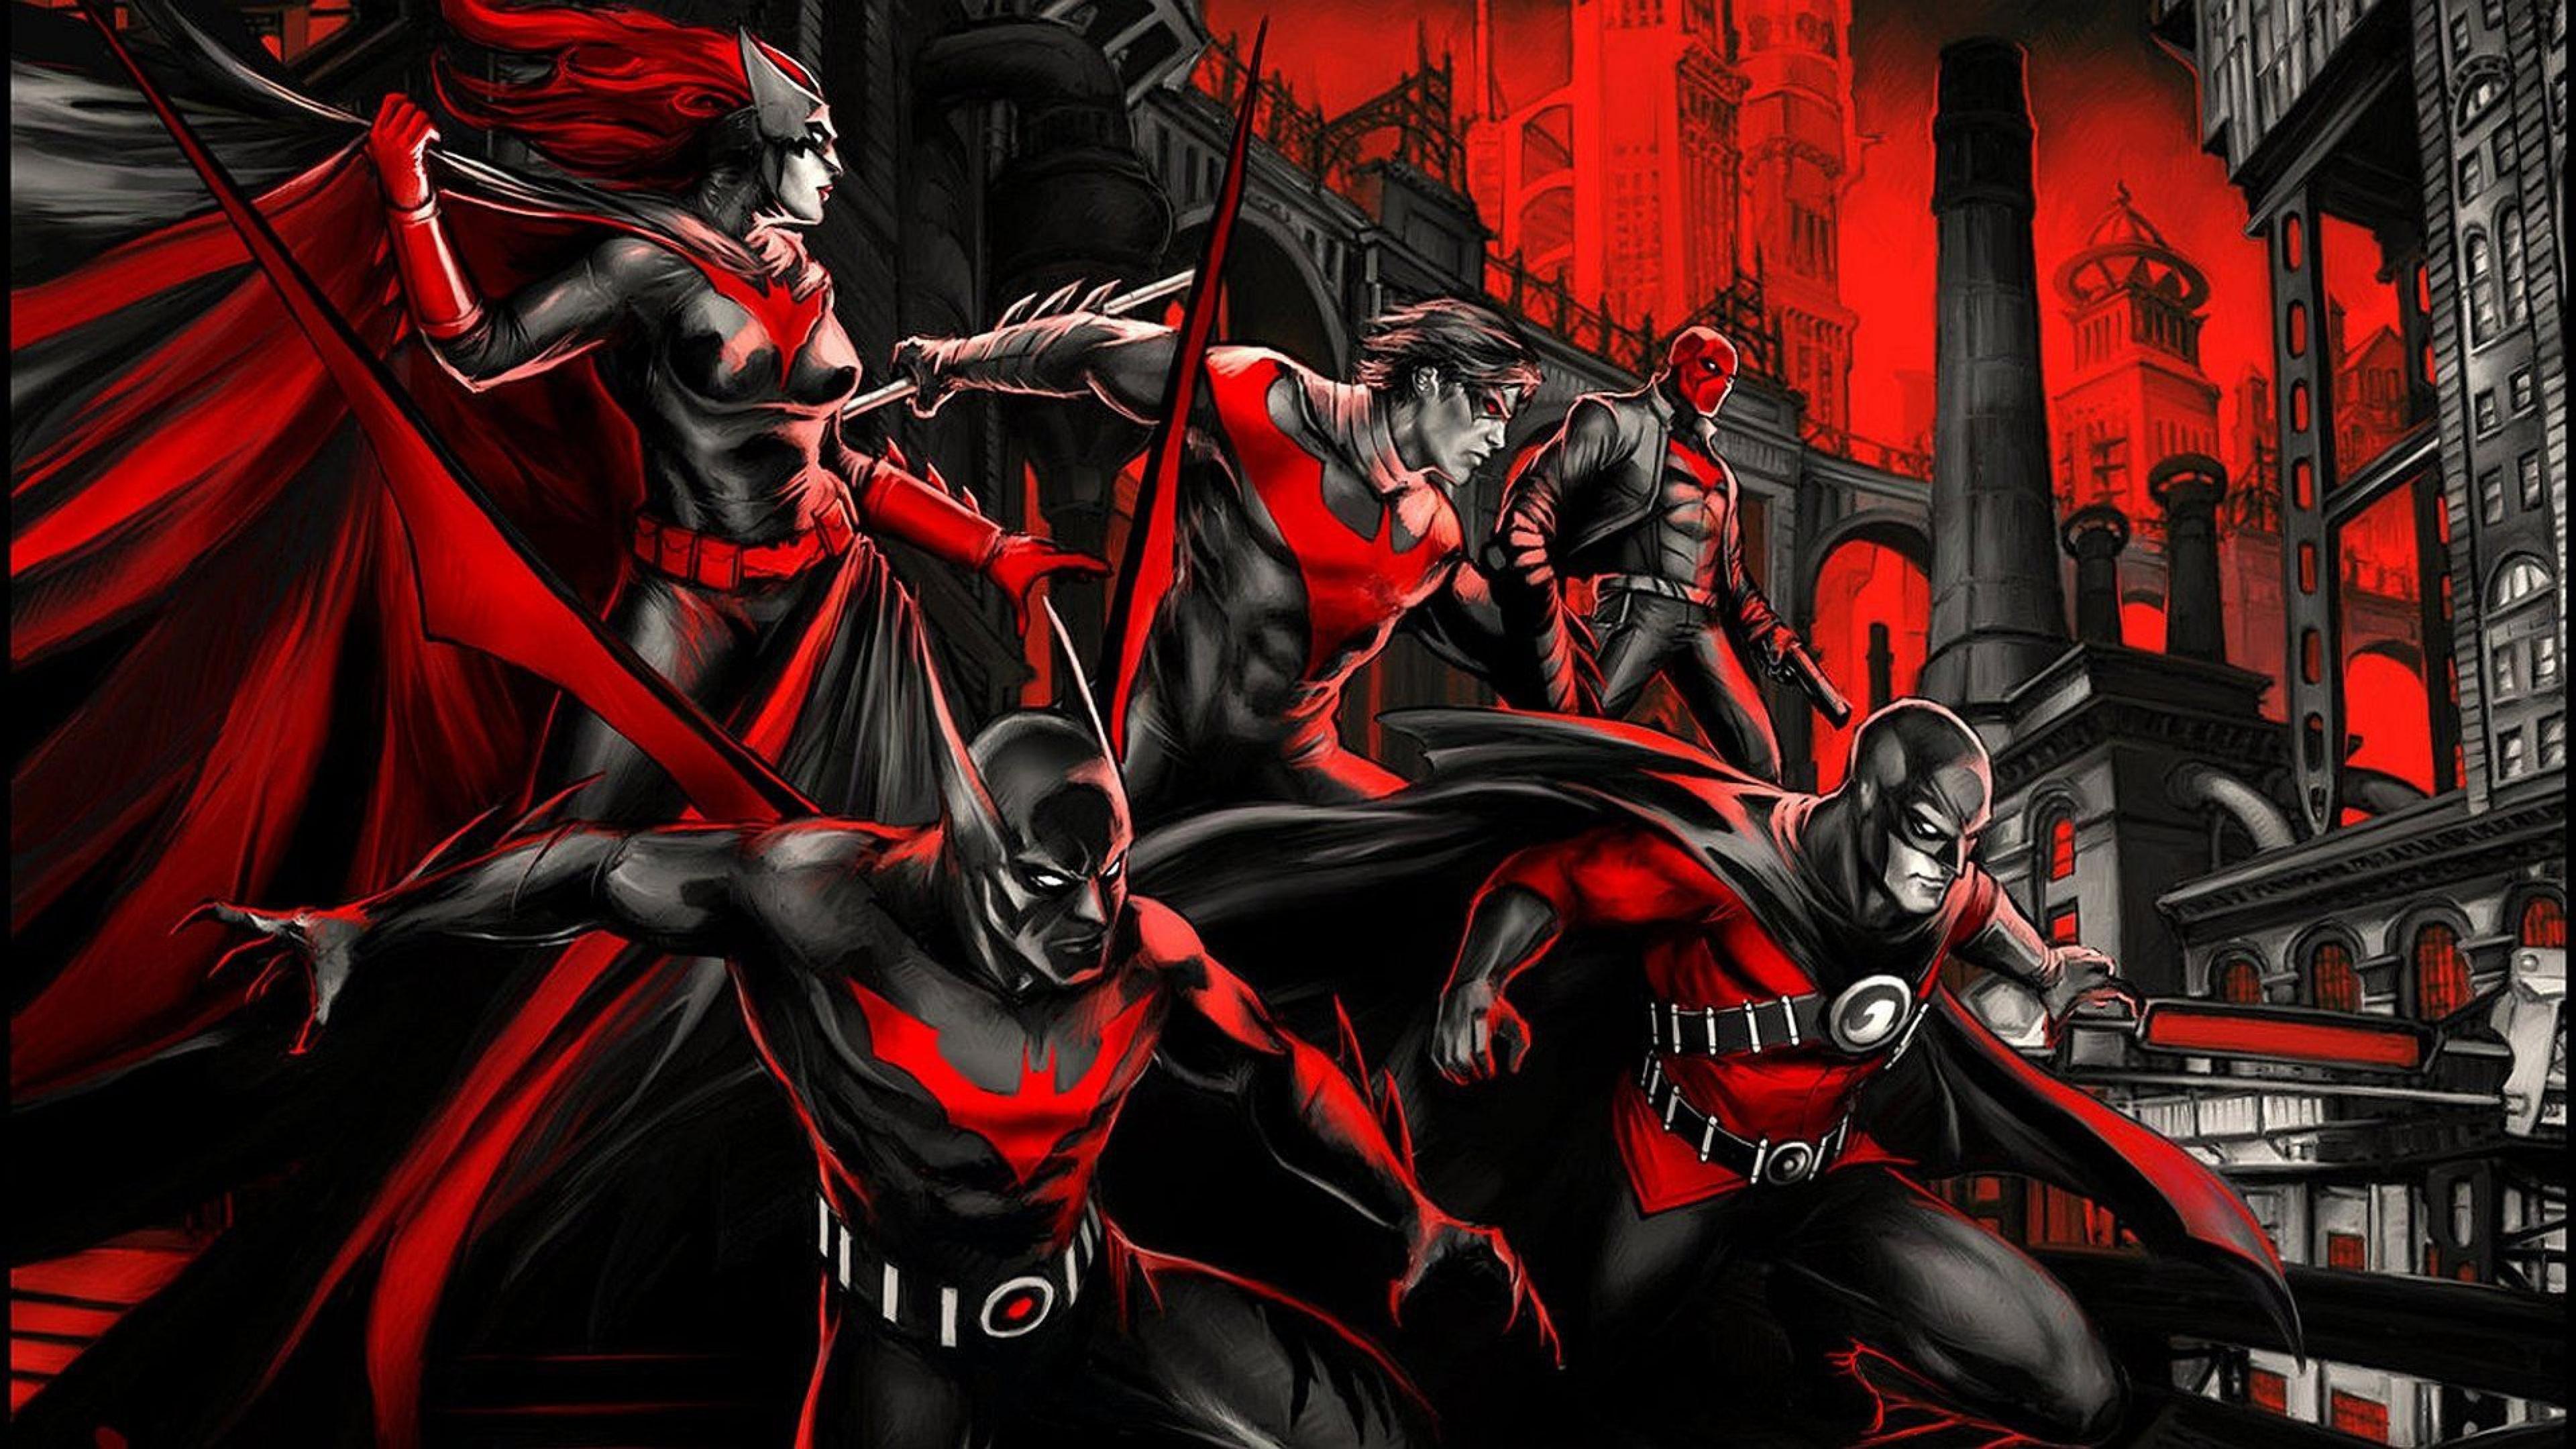 gotham in red 1538786525 - Gotham In Red - superheroes wallpapers, robin wallpapers, red hood wallpapers, nightwing wallpapers, hd-wallpapers, gotham wallpapers, digital art wallpapers, batwoman wallpapers, batman wallpapers, artwork wallpapers, 4k-wallpapers